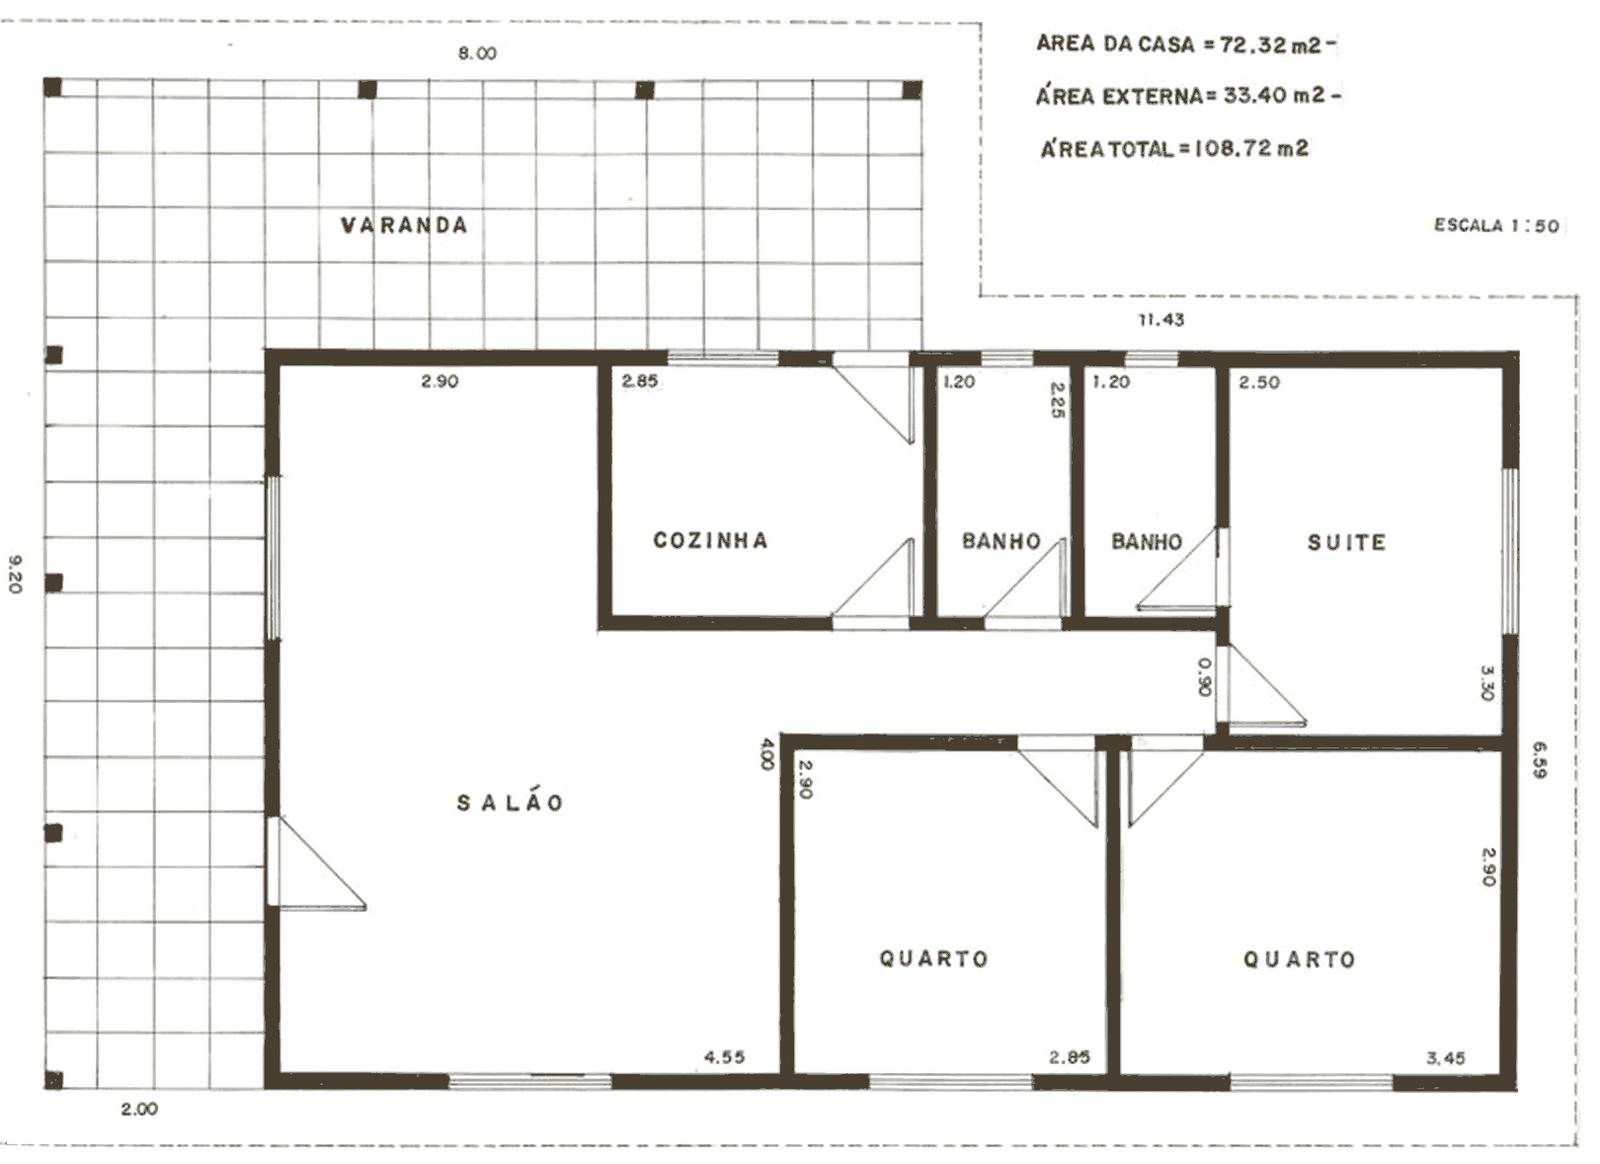 Planta baixa de casa com 108m² e varanda coberta